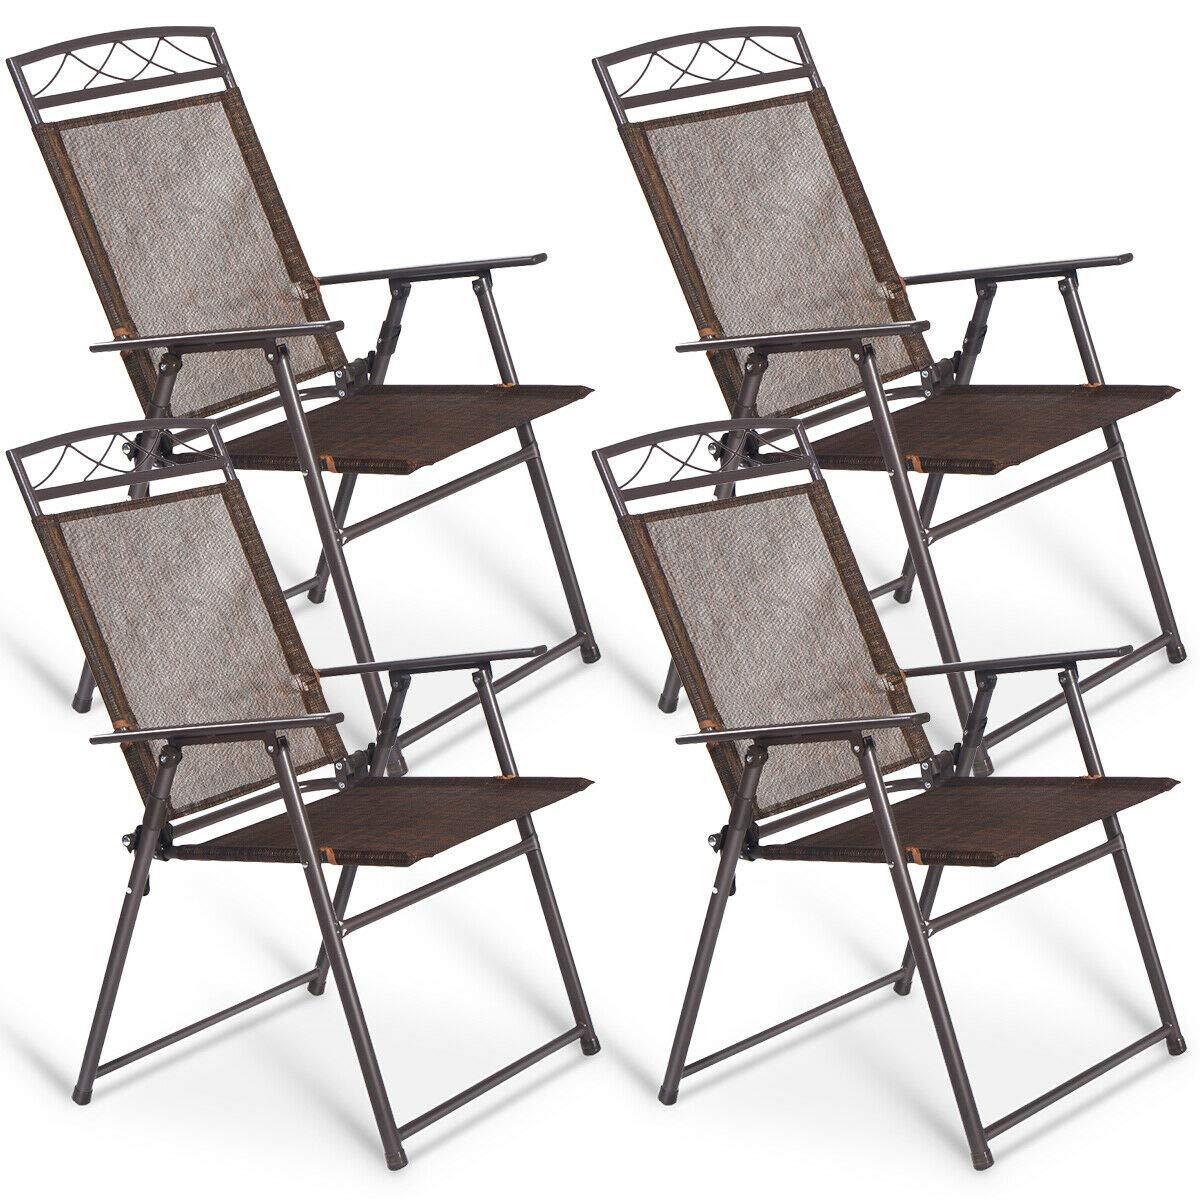 Giantex Set of 4 Patio Folding Sling Chairs Steel Camping Deck Garden Pool Backyard Chairs by Giantex